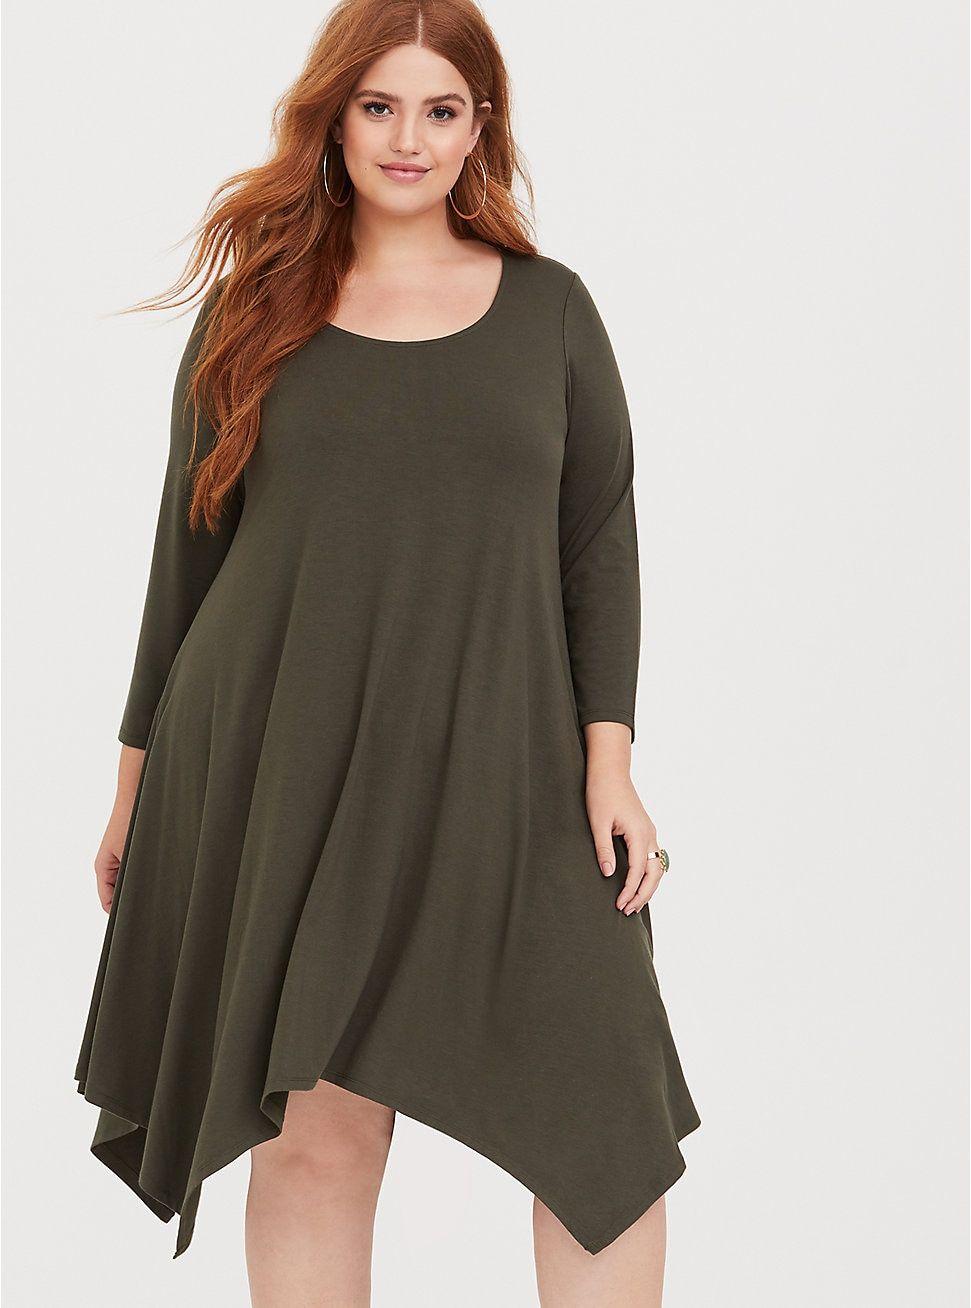 412a075d0db Olive Jersey Handkerchief Dress in 2019